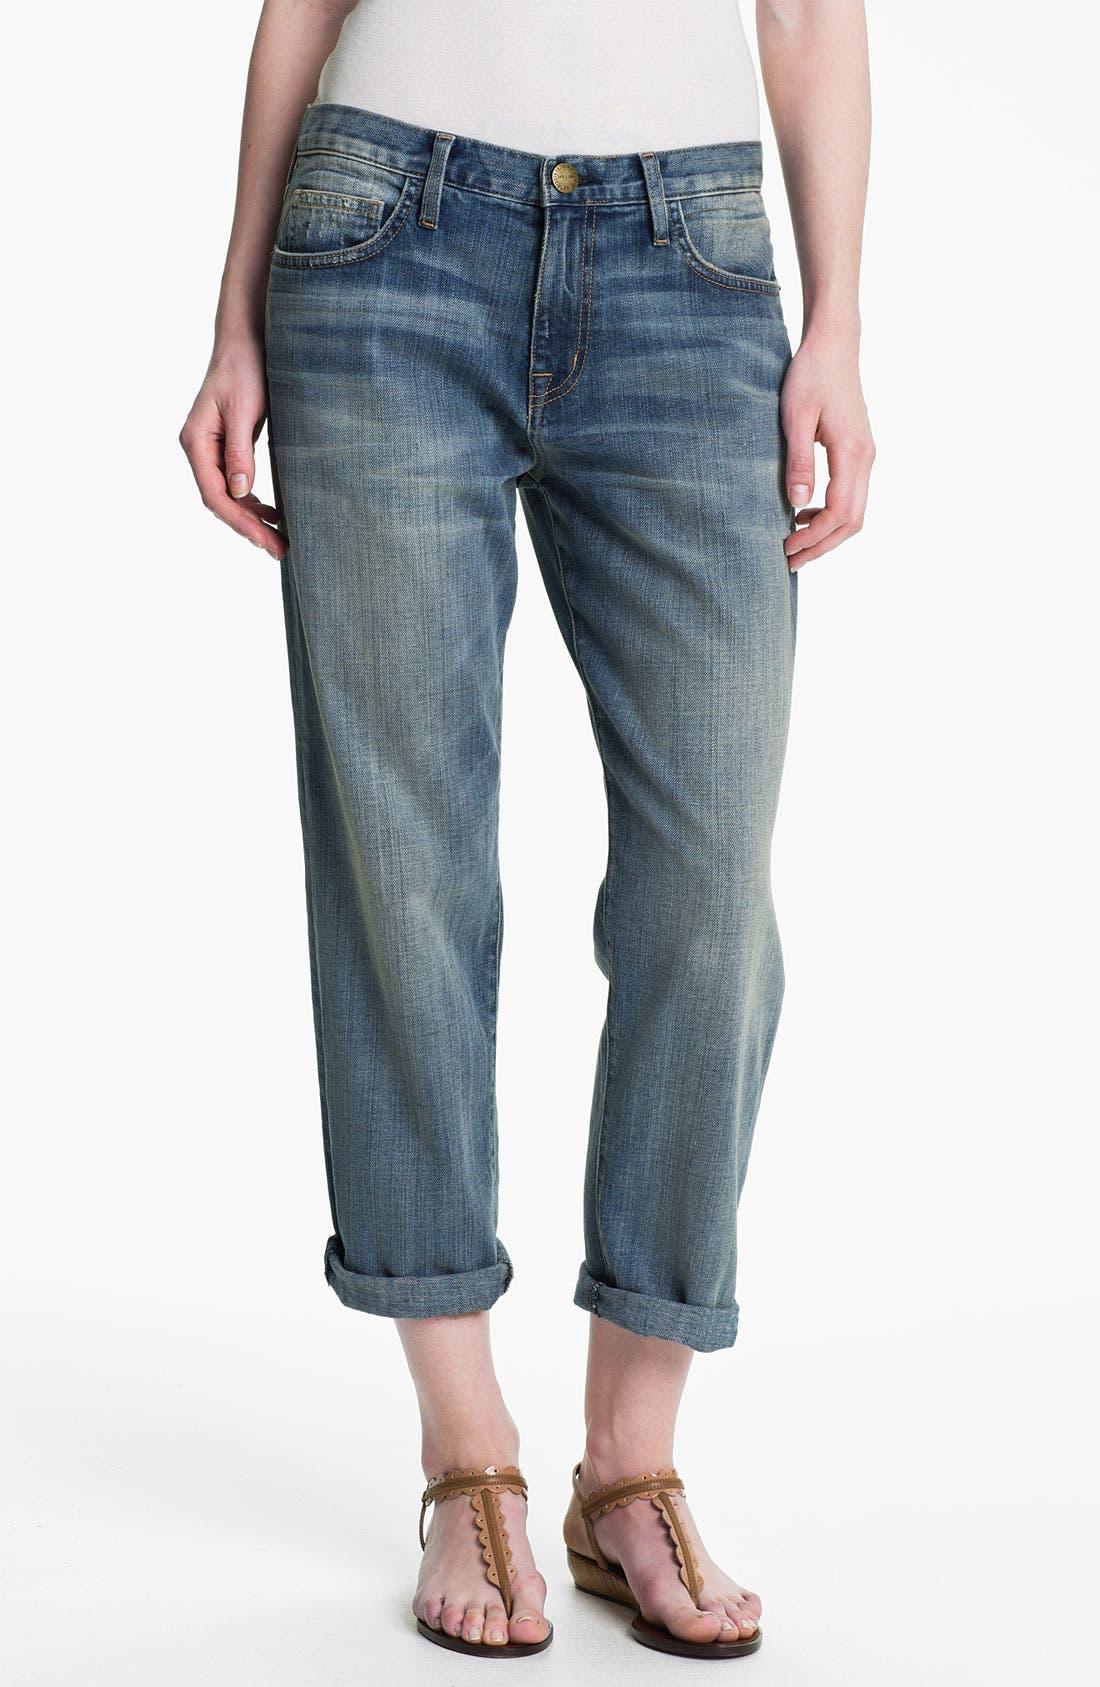 Alternate Image 1 Selected - Current/Elliott 'The Boyfriend Jean' Jeans (Super Loved)